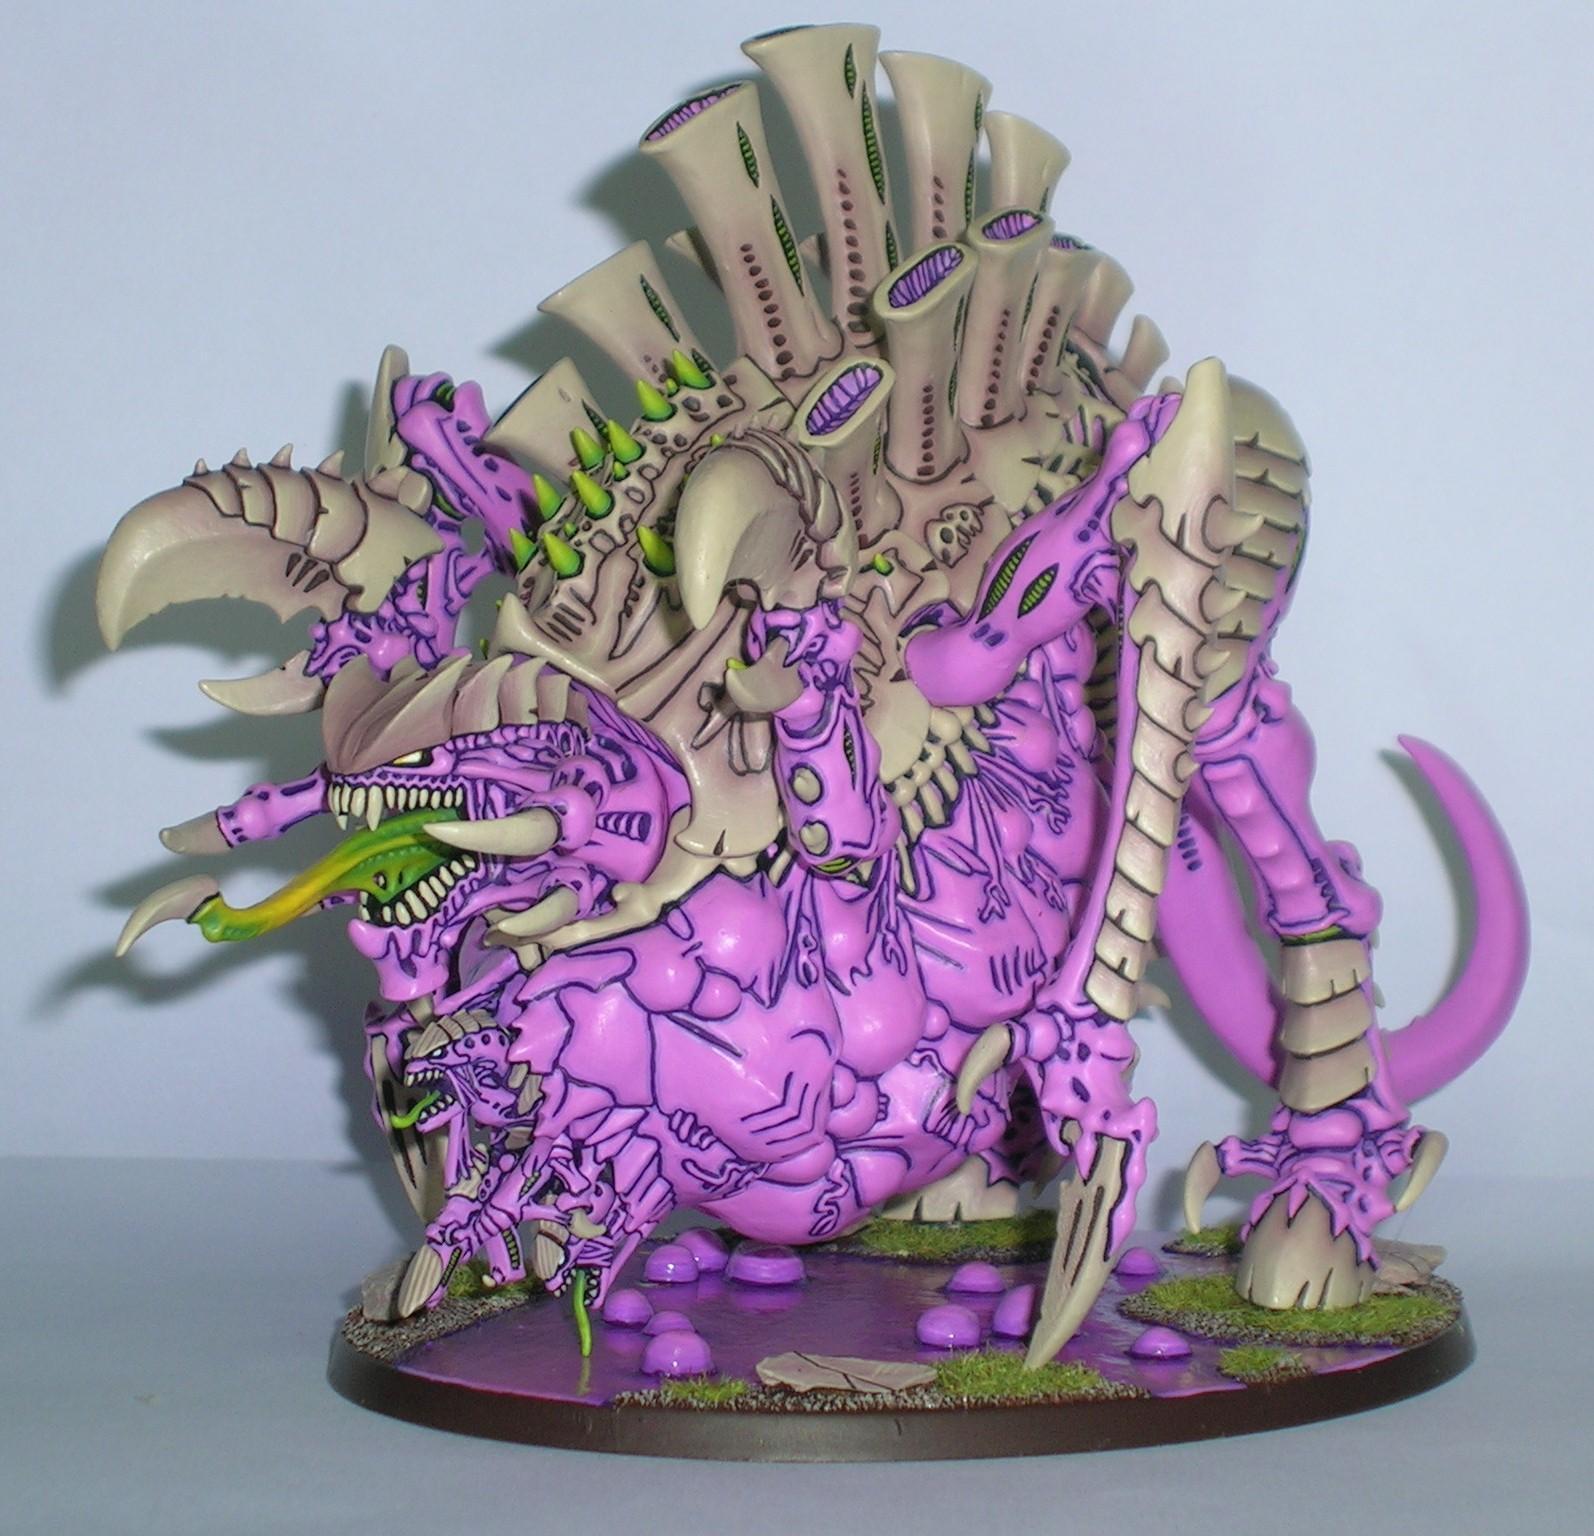 Bone, Monstrous Creature, Pink, Tyranids